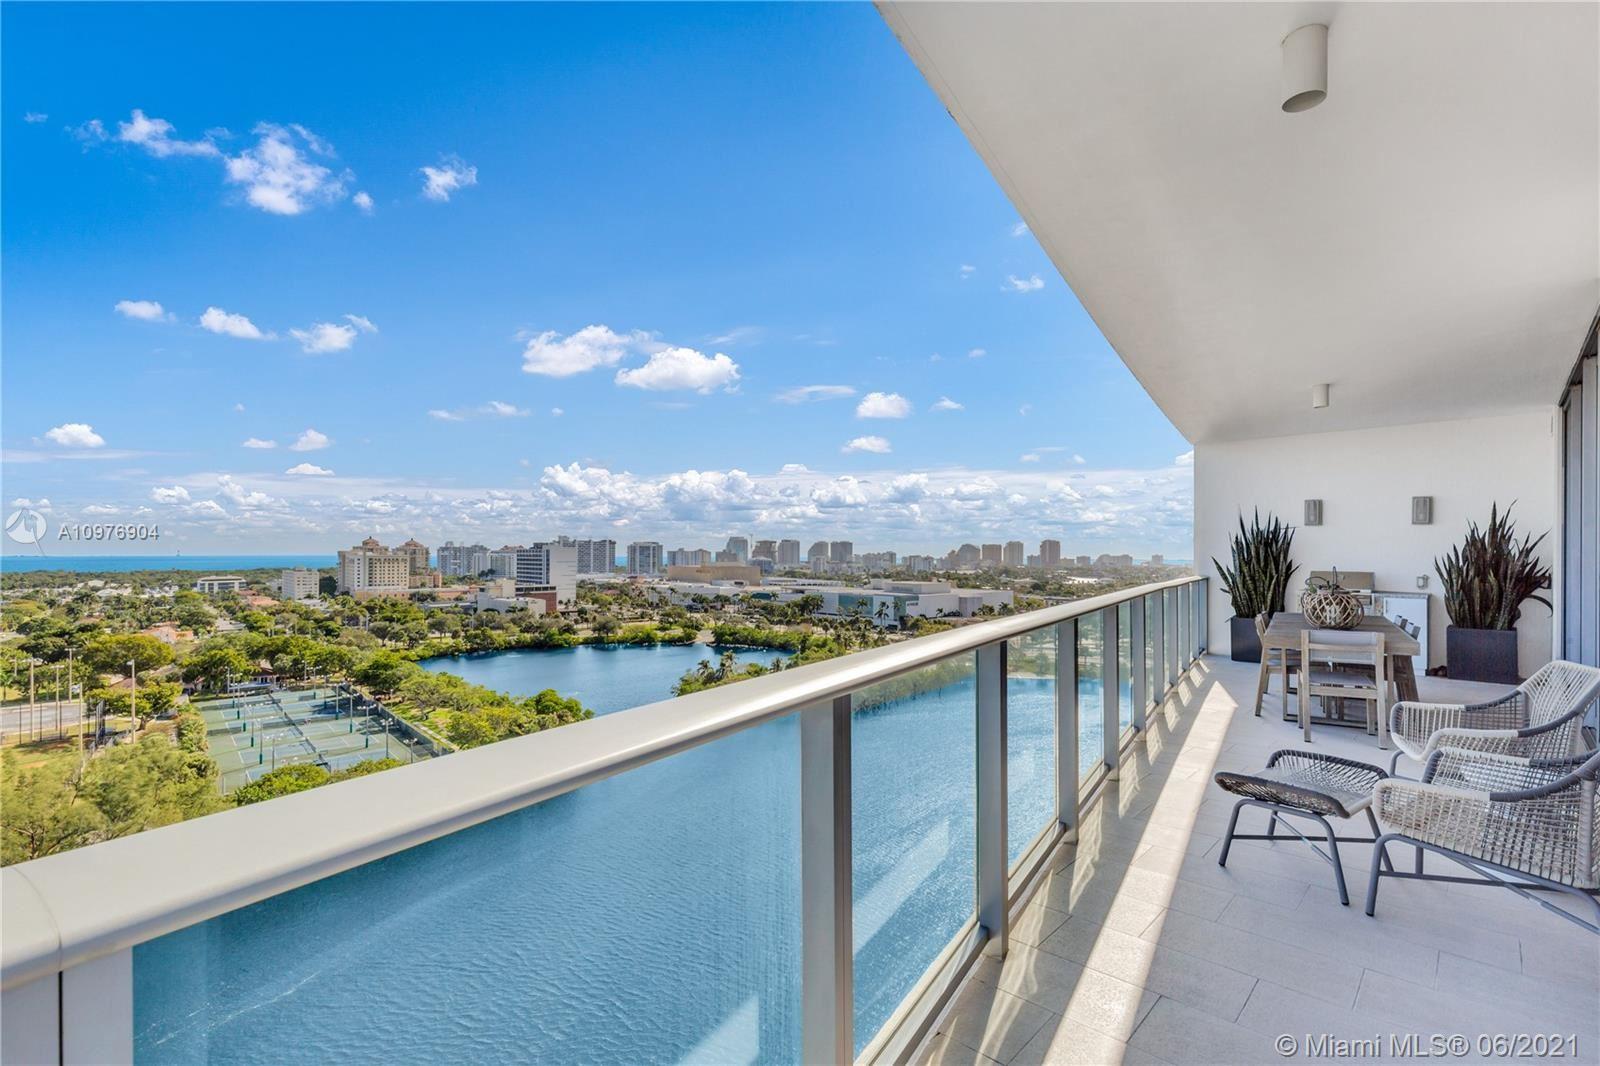 1180 N Federal Hwy #PH1501, Fort Lauderdale, FL 33304 - #: A10976904